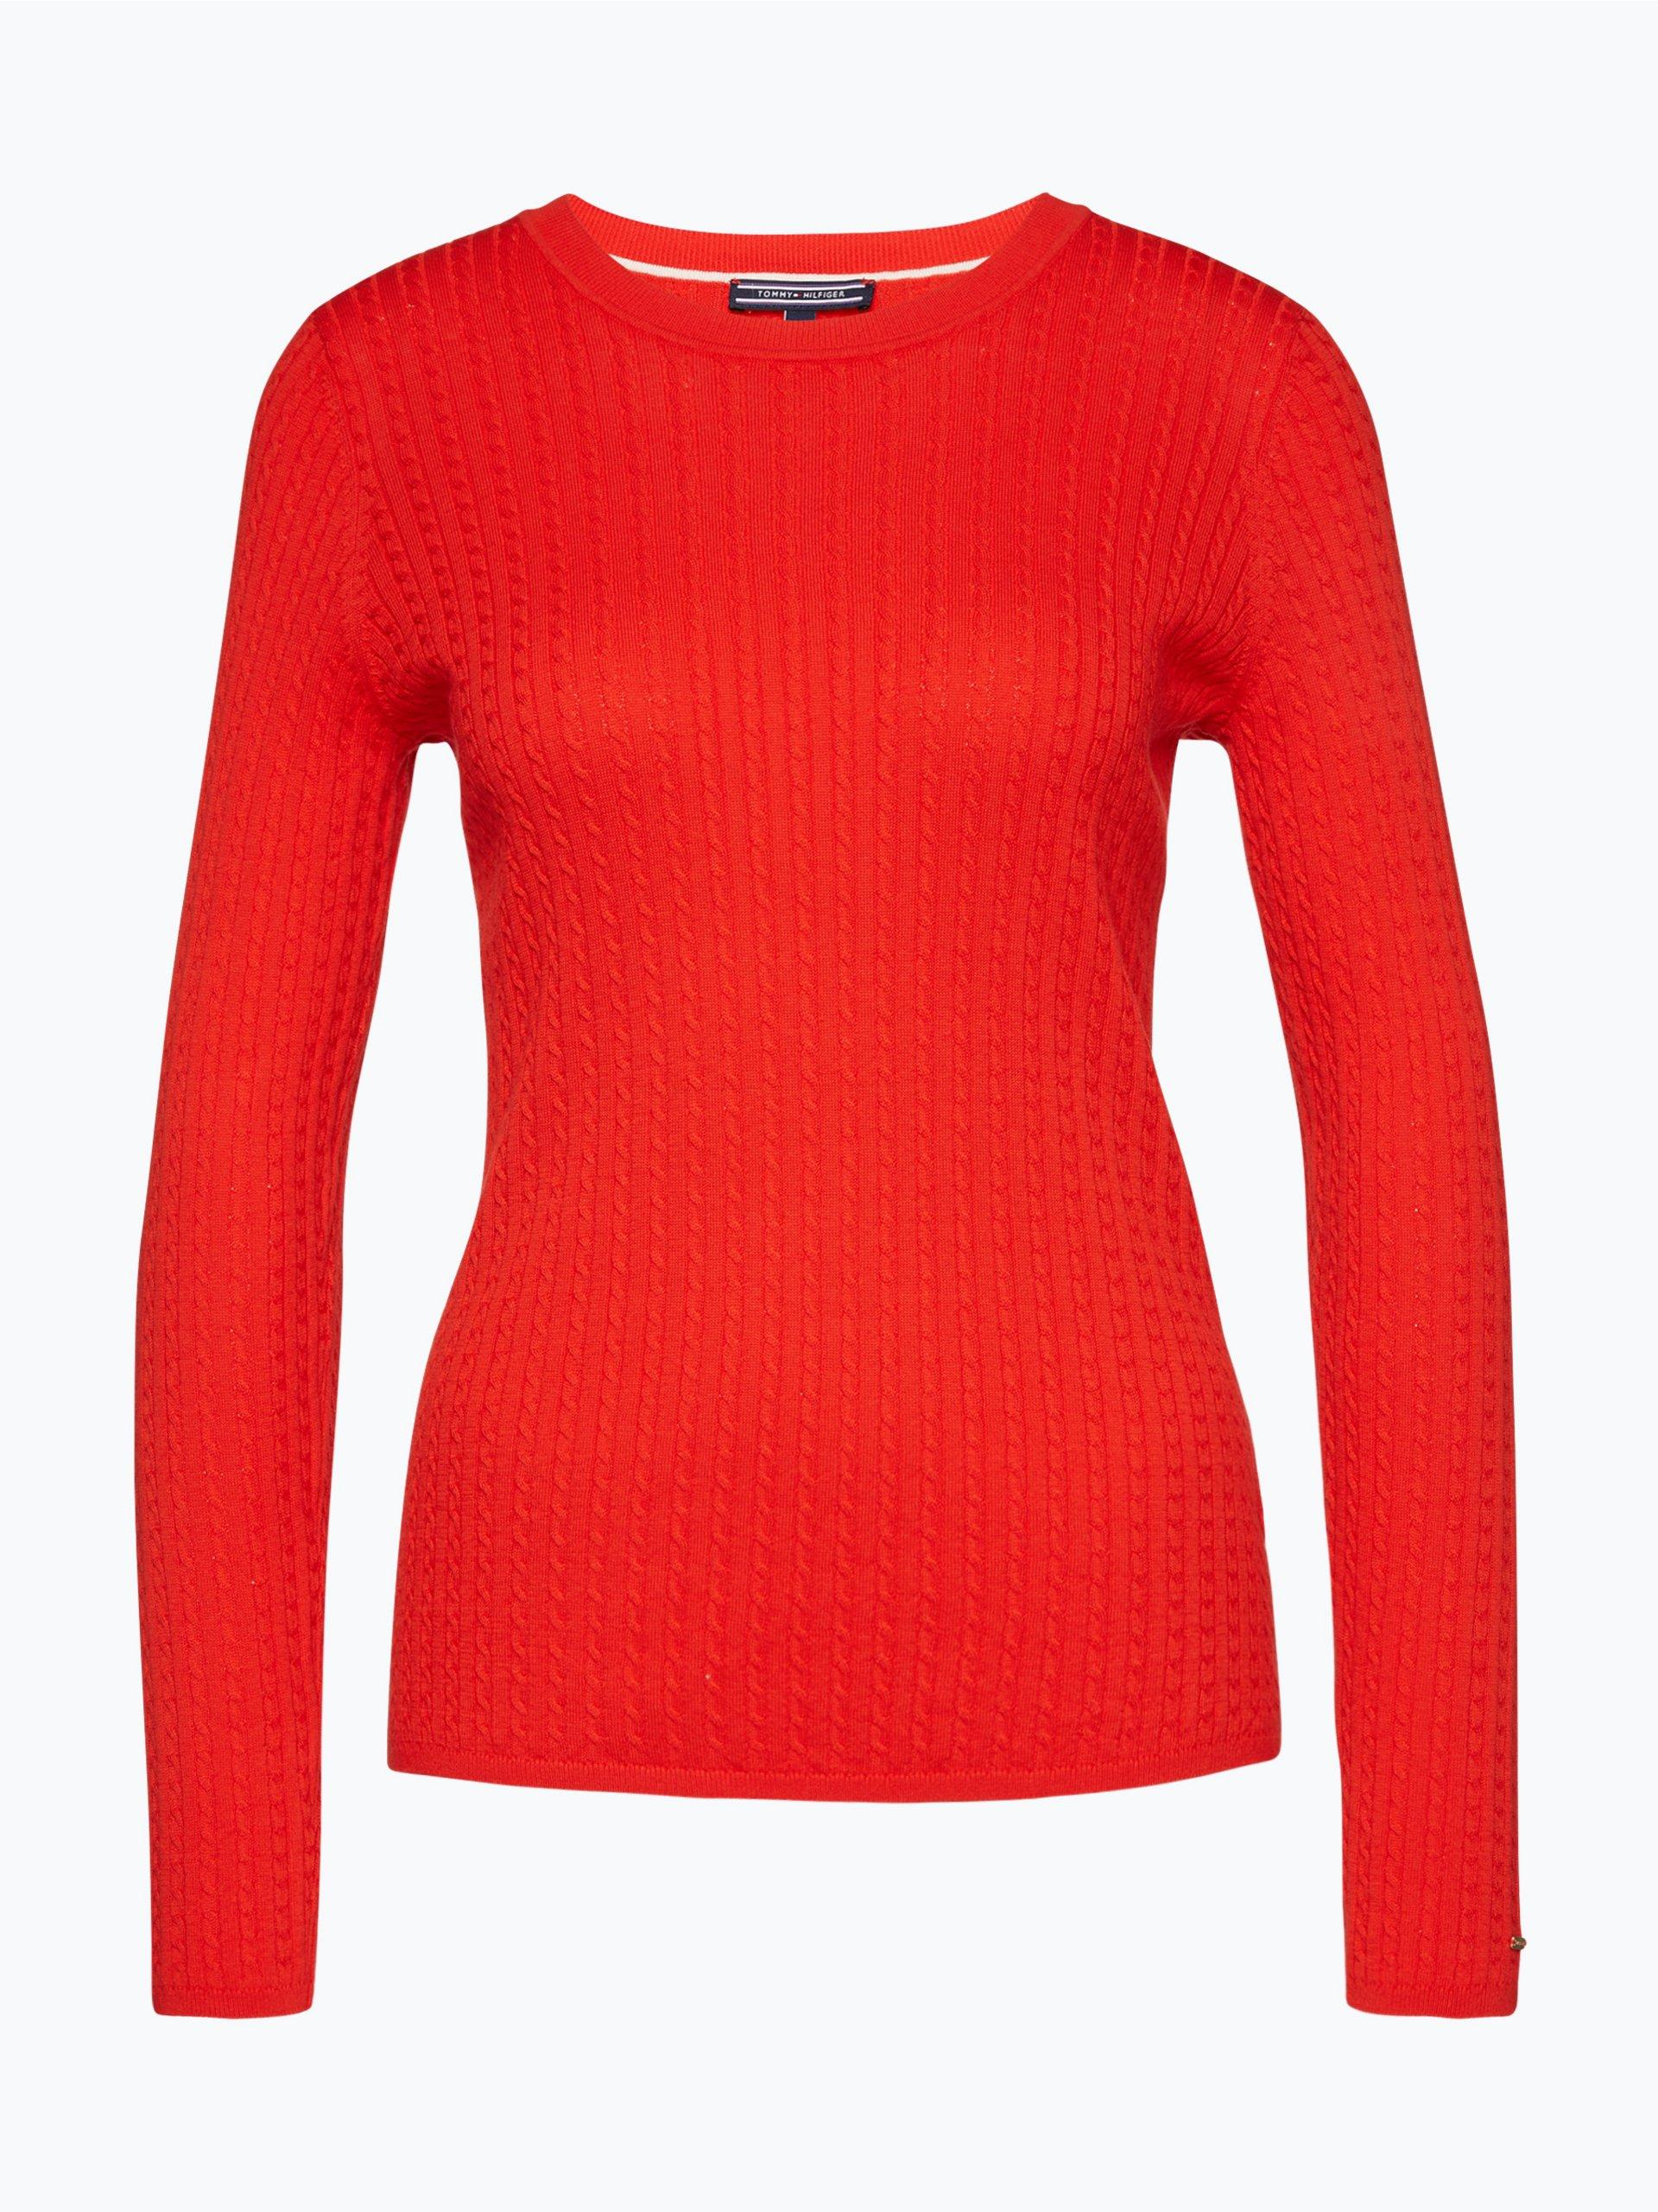 tommy hilfiger damen pullover erca rot uni online kaufen. Black Bedroom Furniture Sets. Home Design Ideas